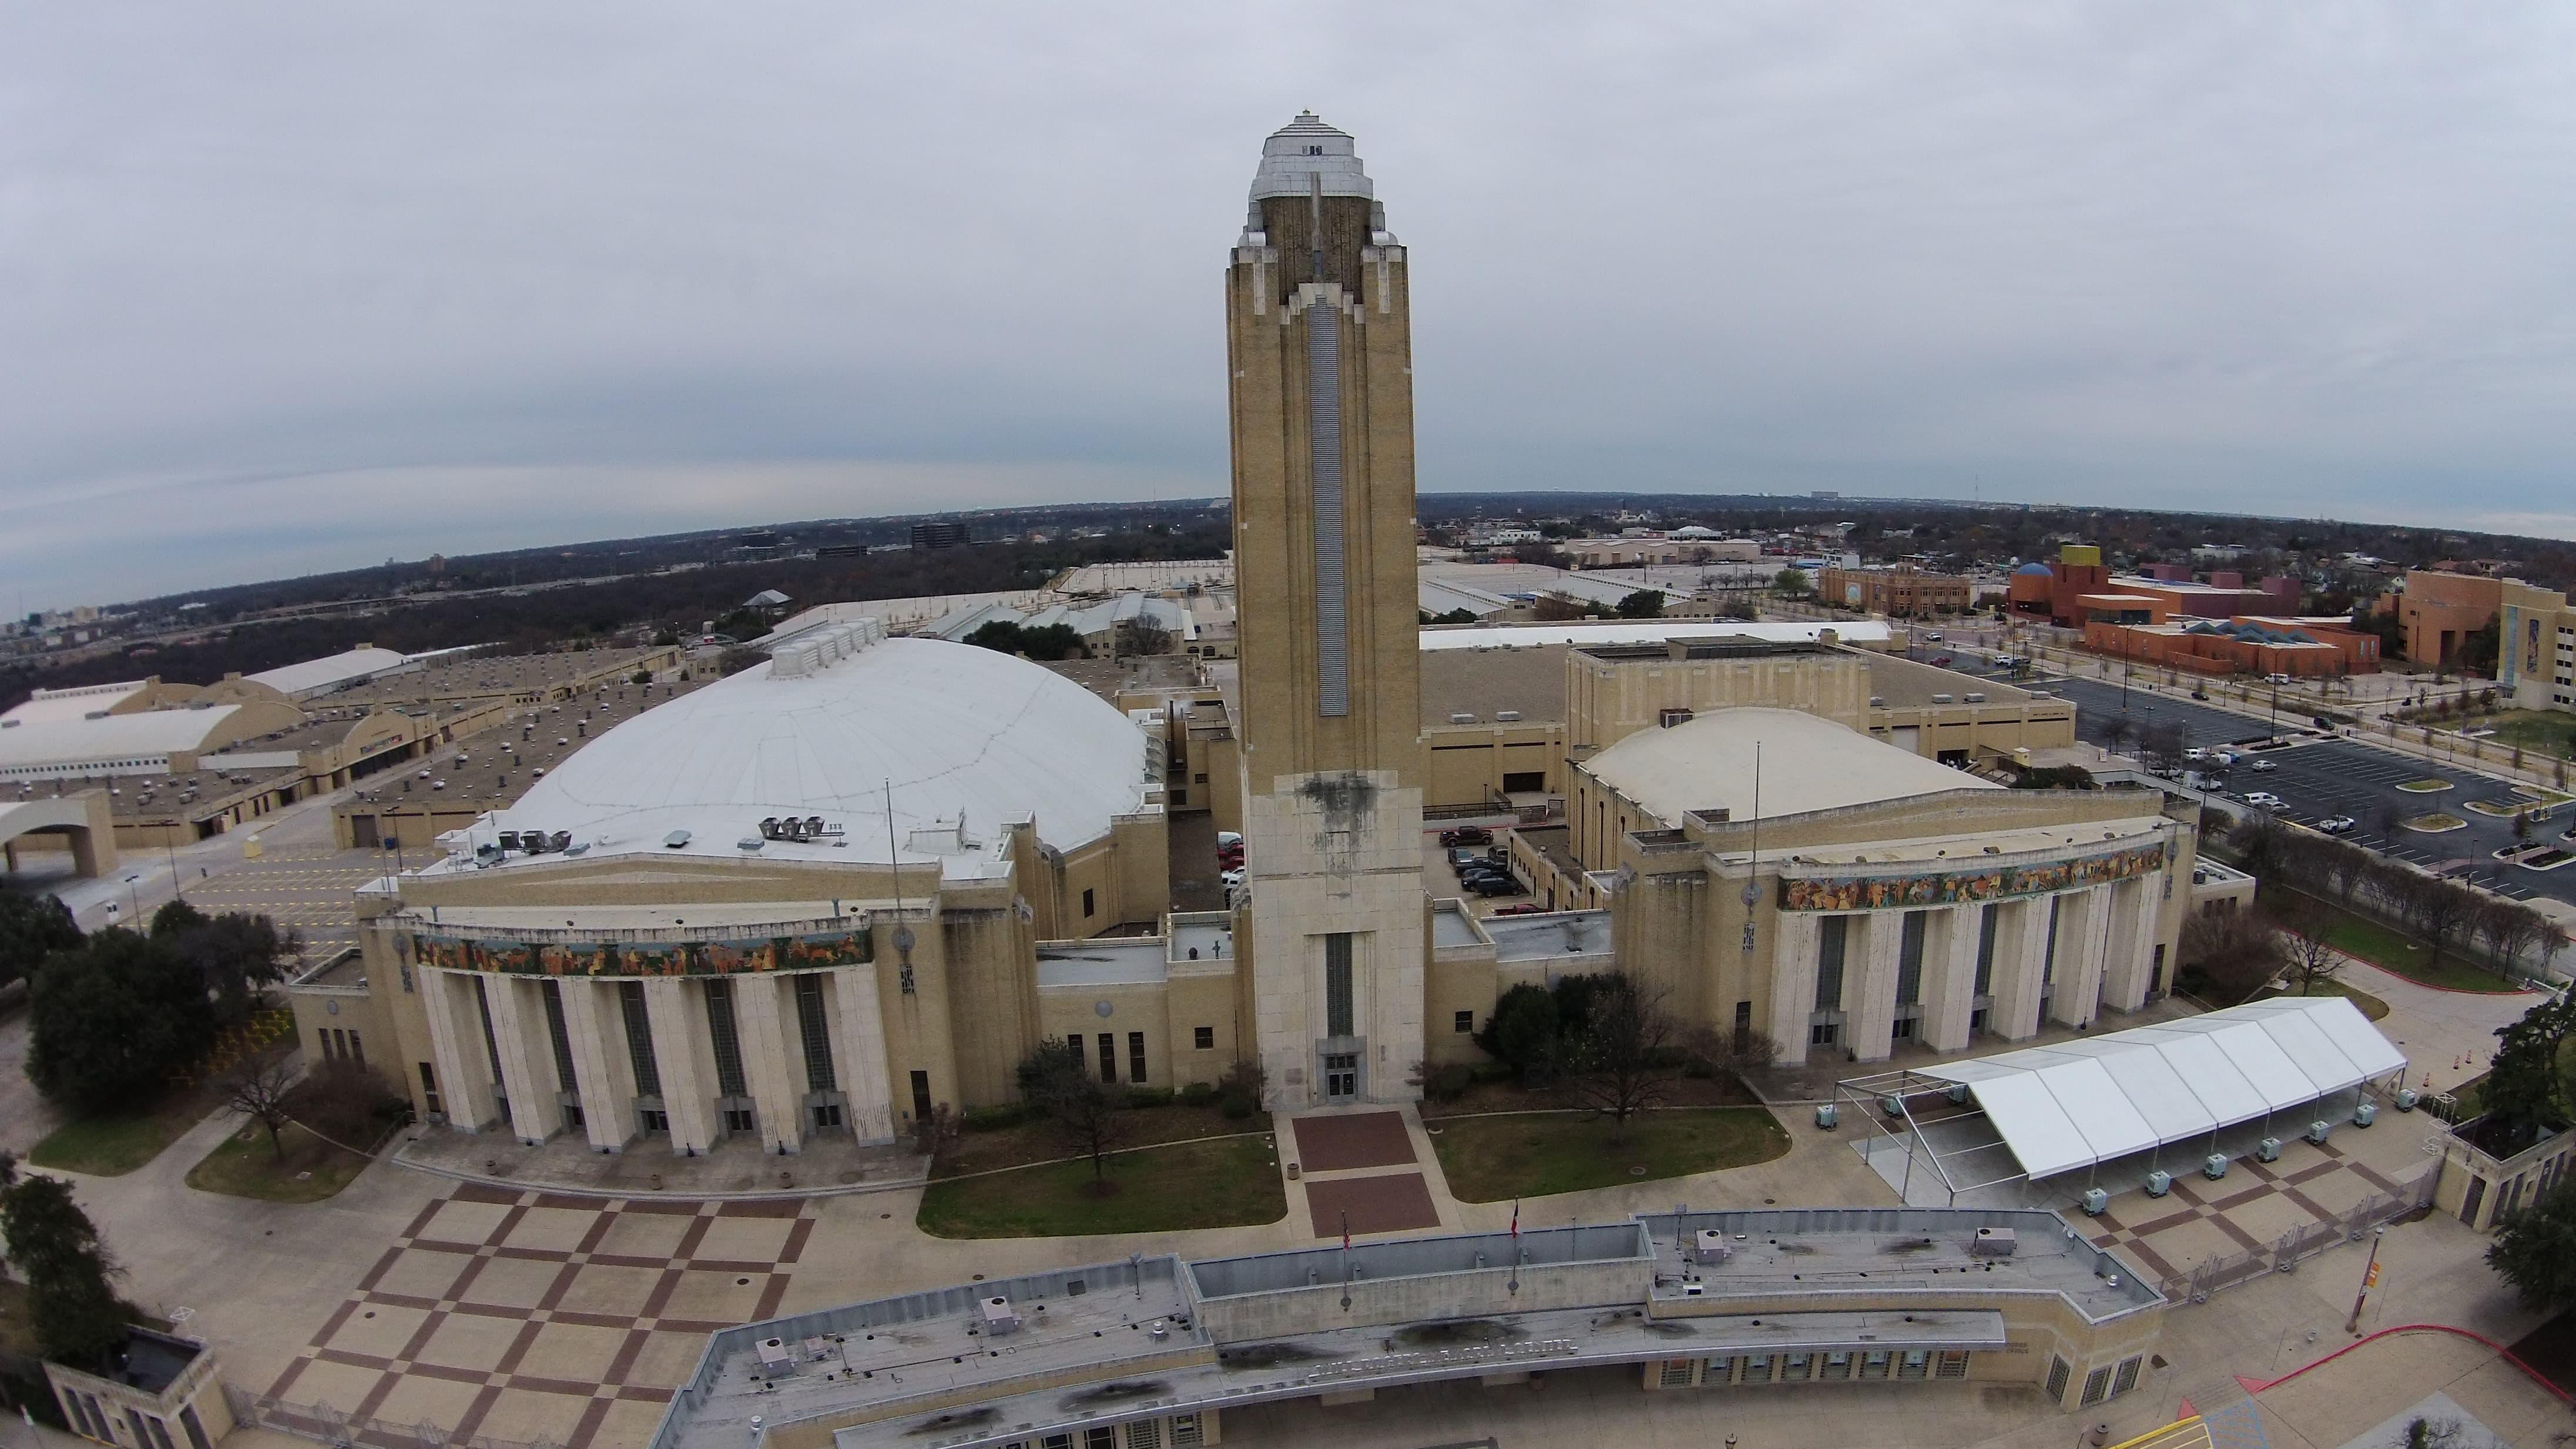 Will Rogers Memorial Center - ...